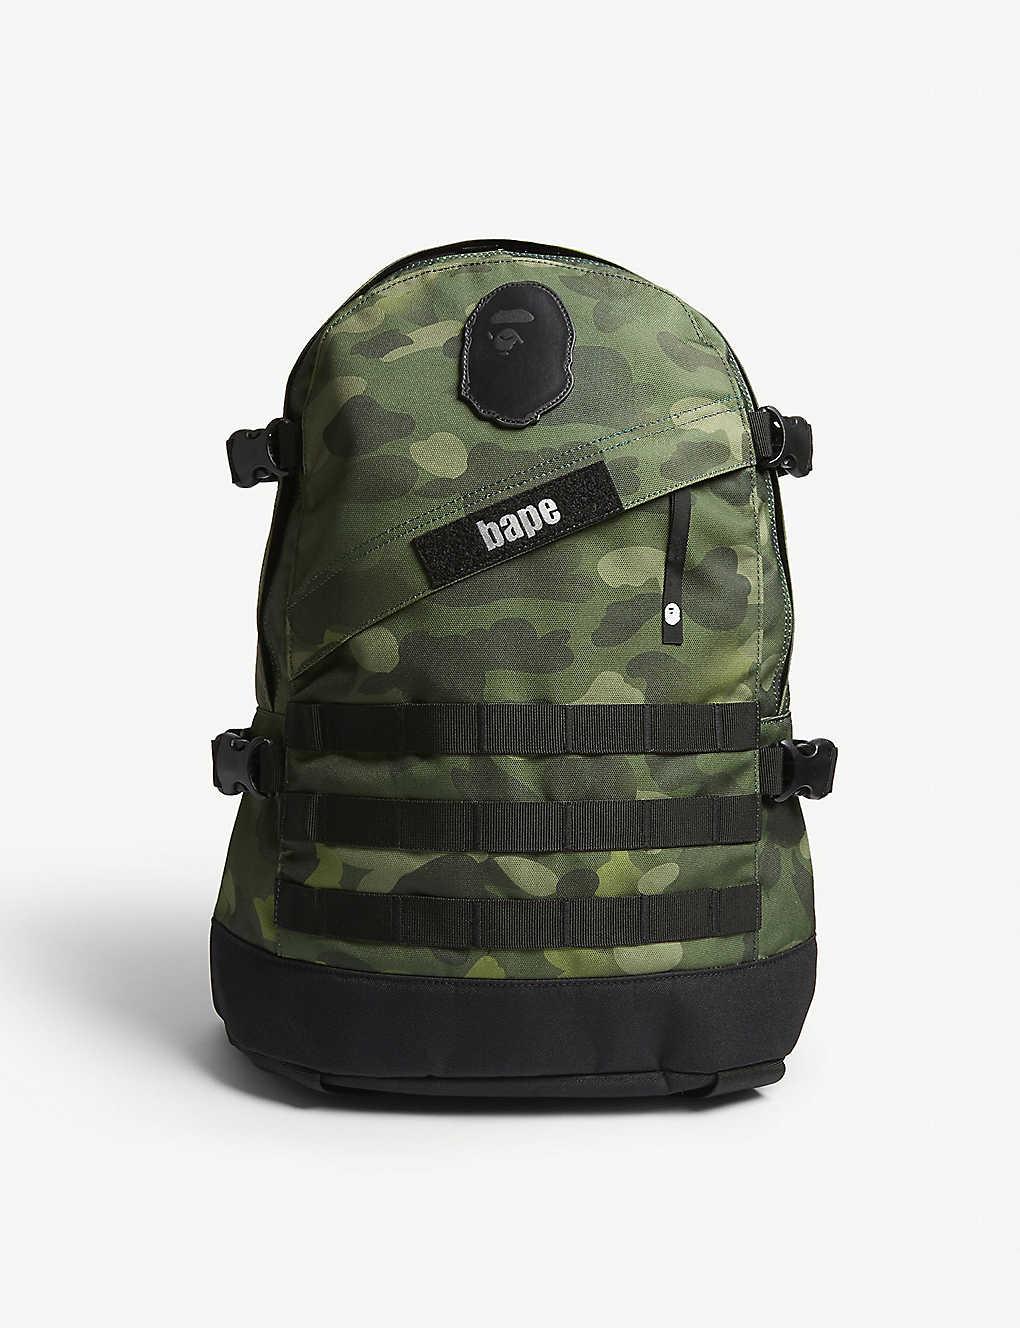 A BATHING APE - Graduation camouflage canvas backpack  b2d266dbd88d3